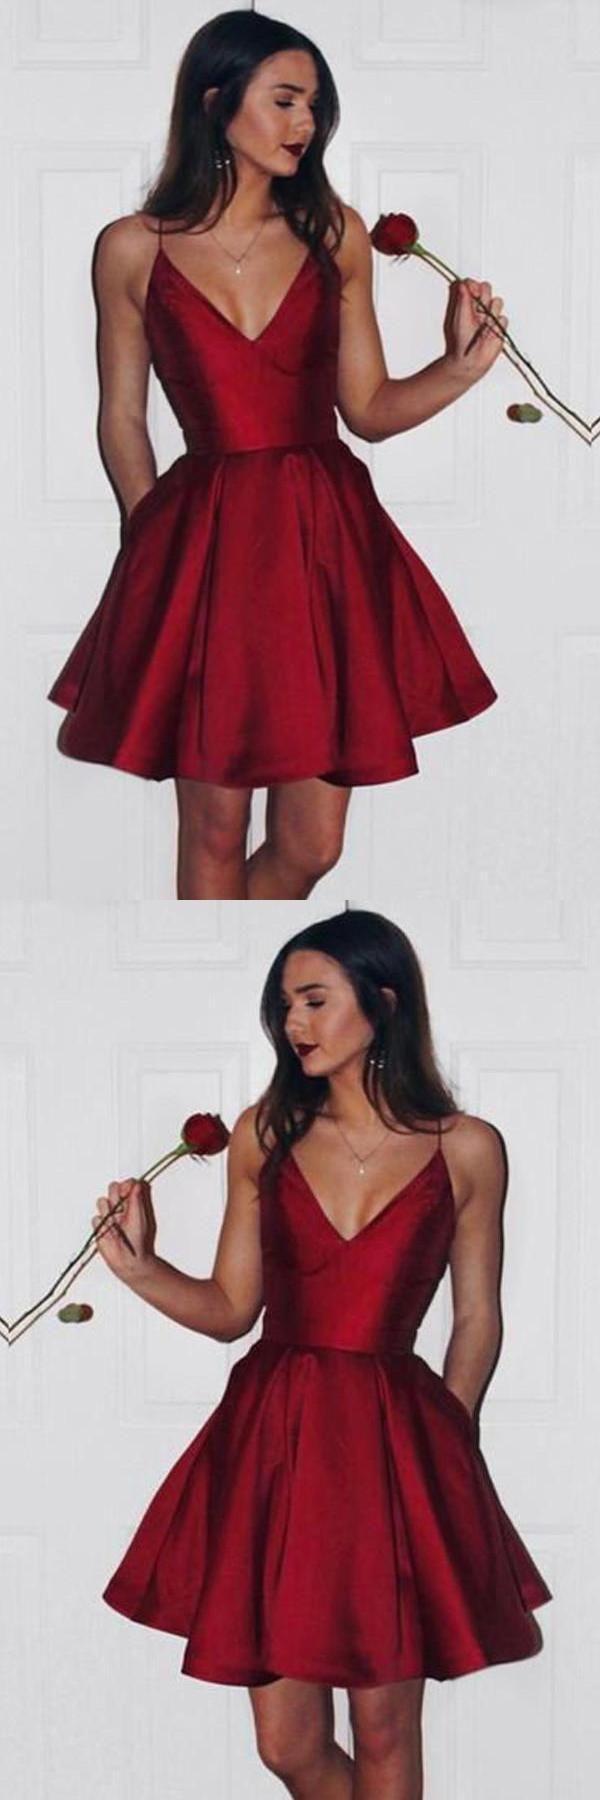 homecoming dresses cute prom dresses prom dresses simple